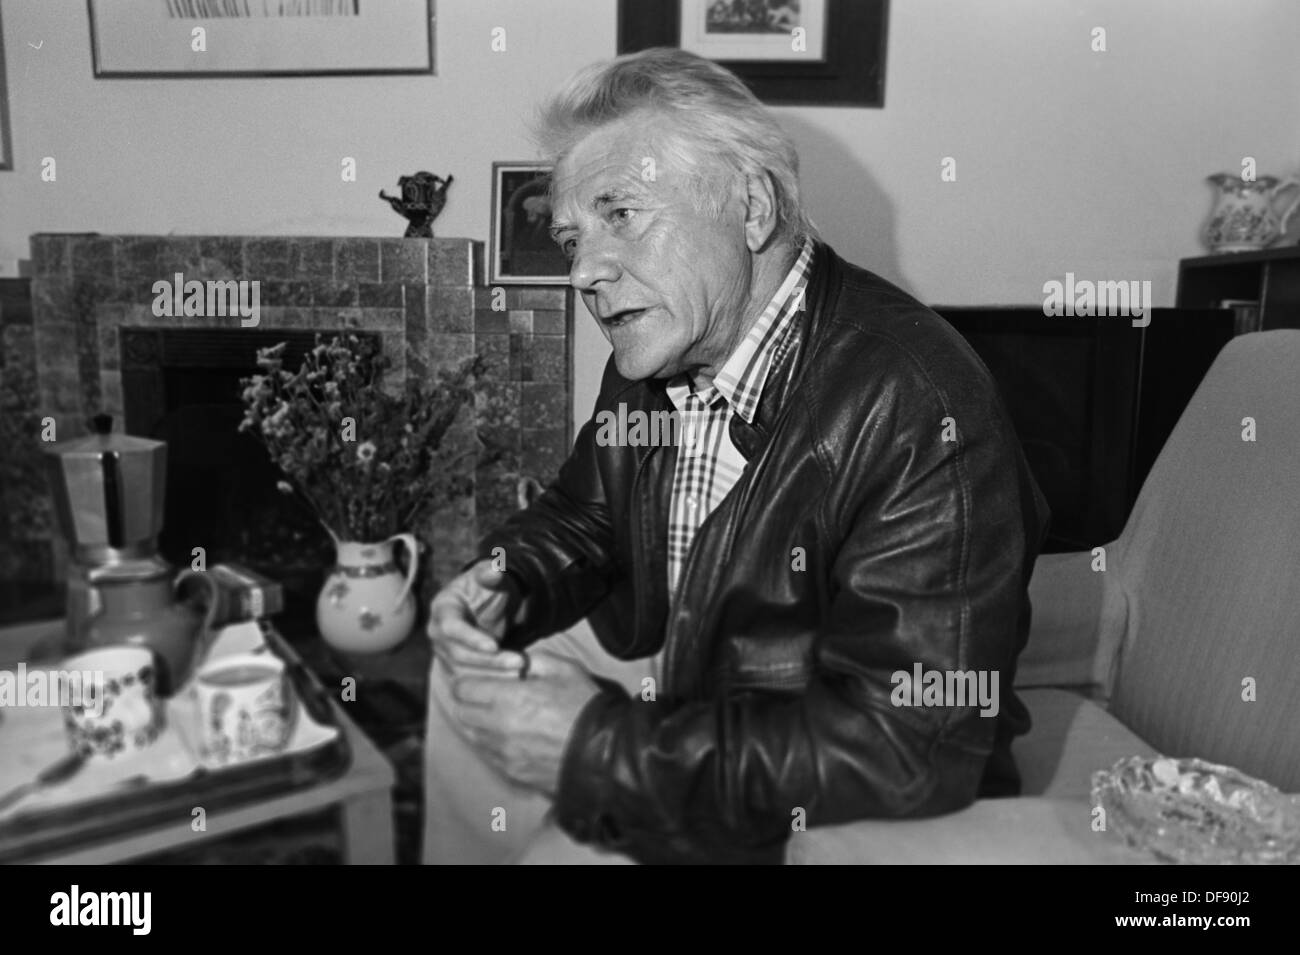 Archivfoto: walisische radikale marxistischen Historikers Gwyn Alf Williams zu Hause in Drefach Felindre, Carmarthenshire, 1991 Stockbild